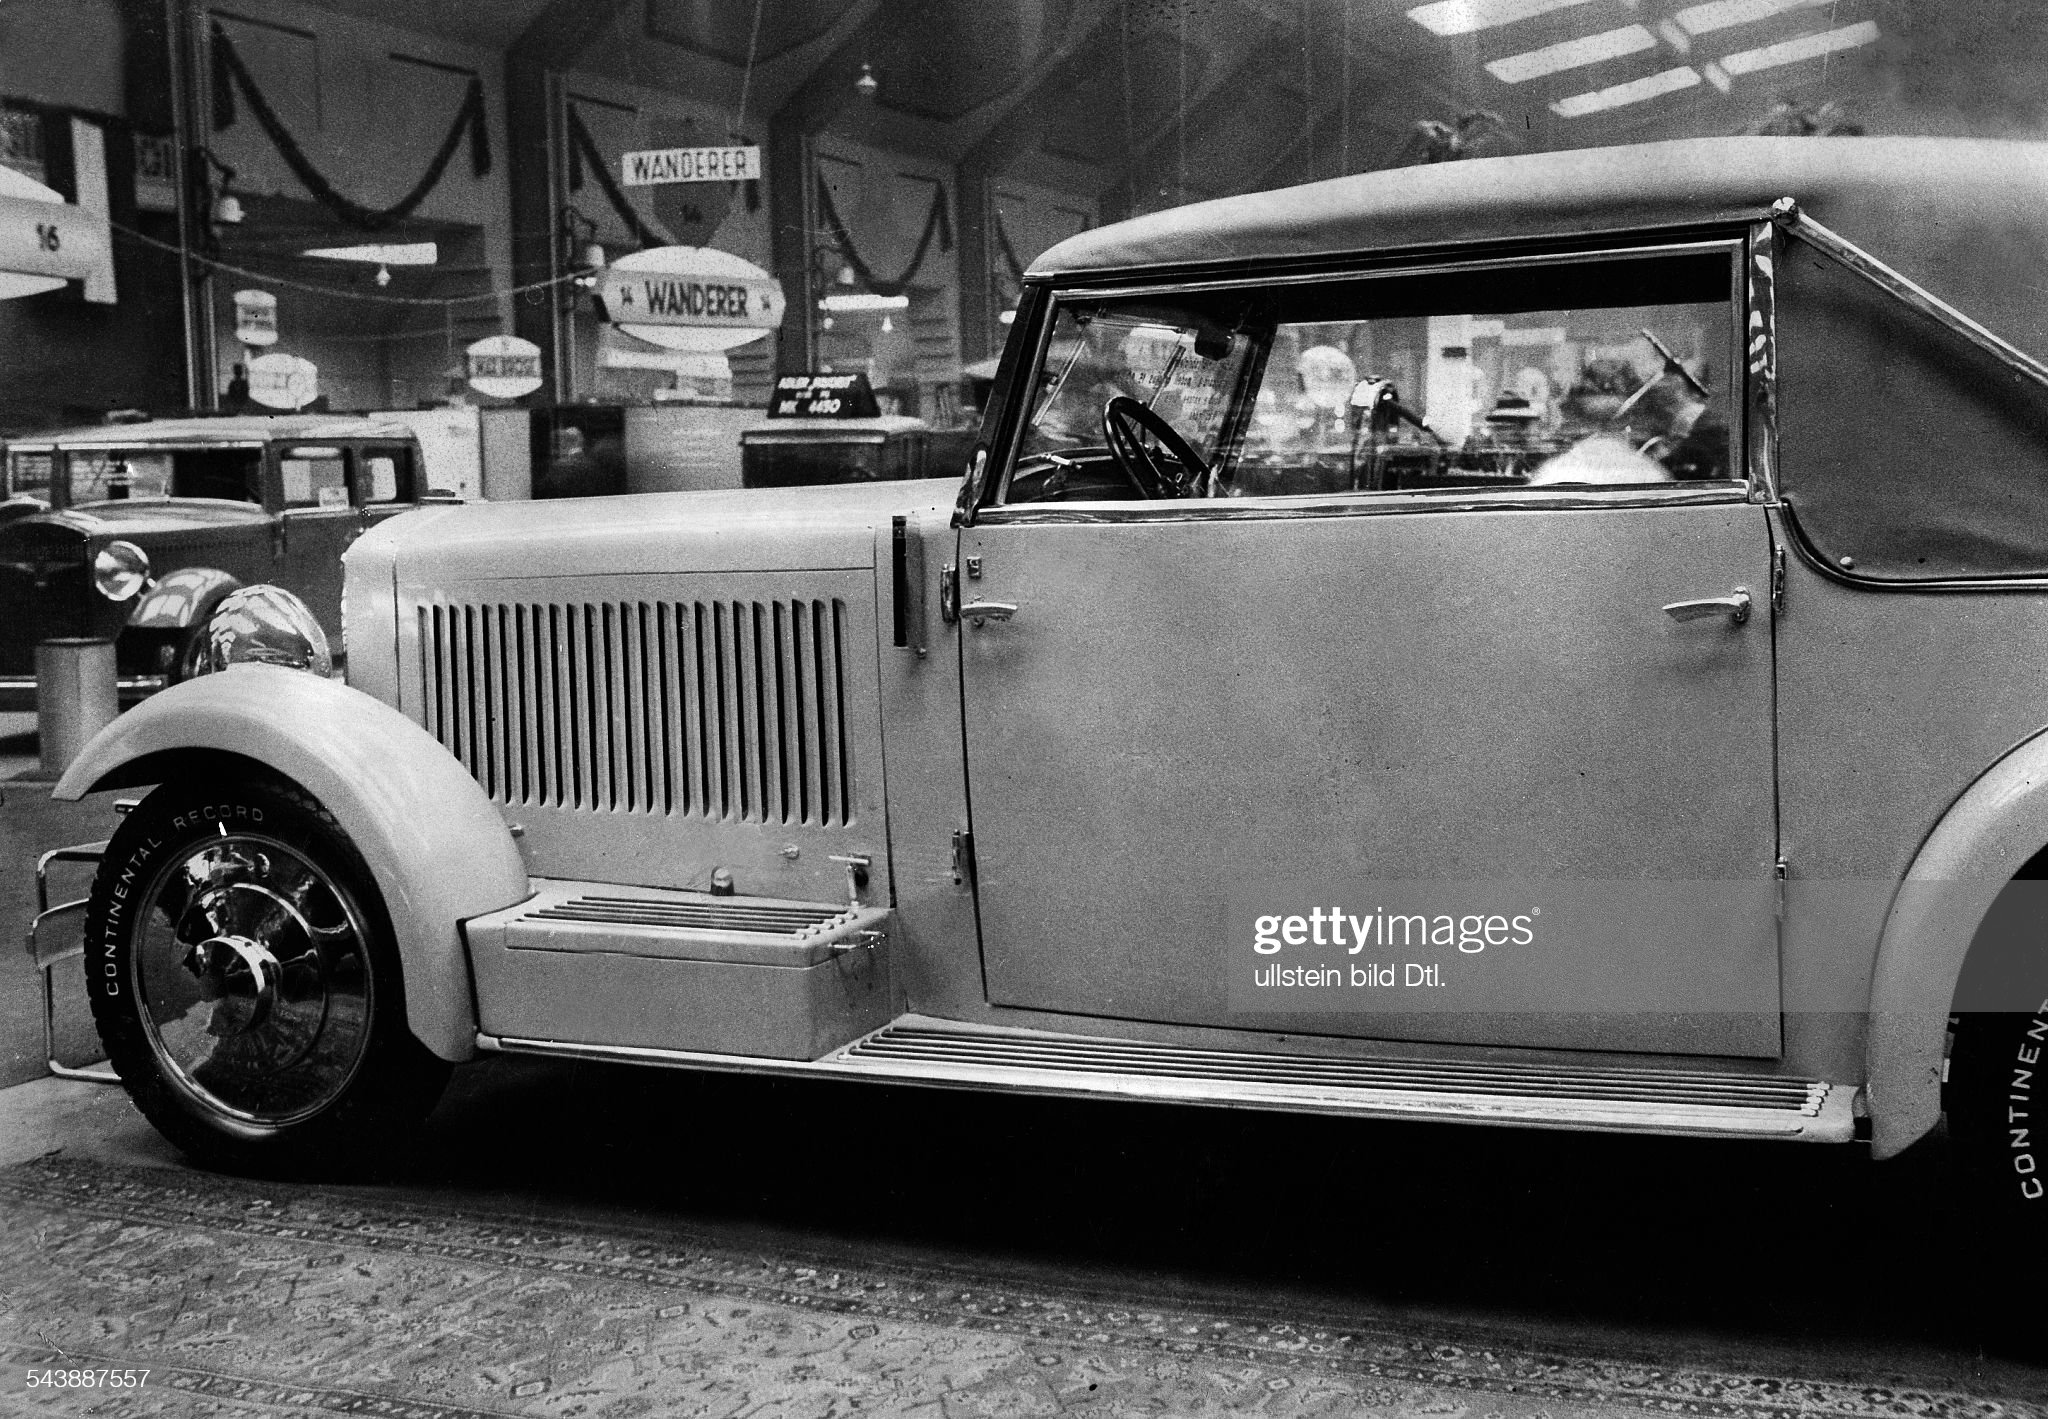 German Empire, car: 'Gropius' Adler - Photographer: Hans Henschke- Published by: 'Die Dame' 14/1931Vintage property of ullstein bild : News Photo